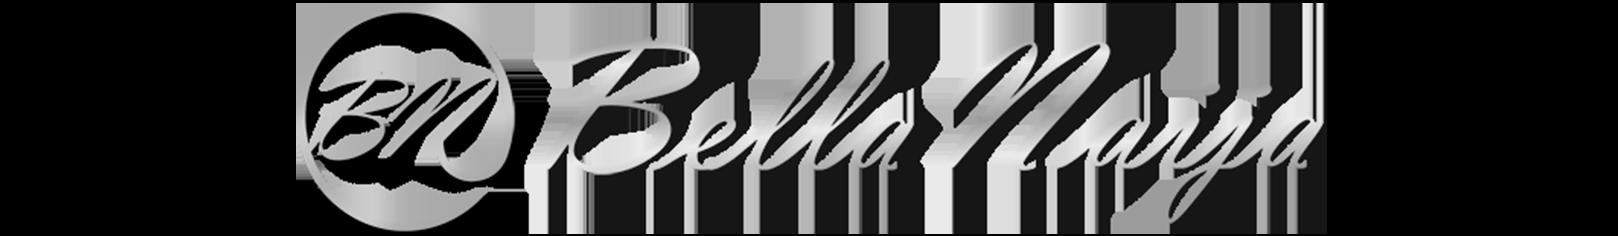 Bella-Naija_logo-grey